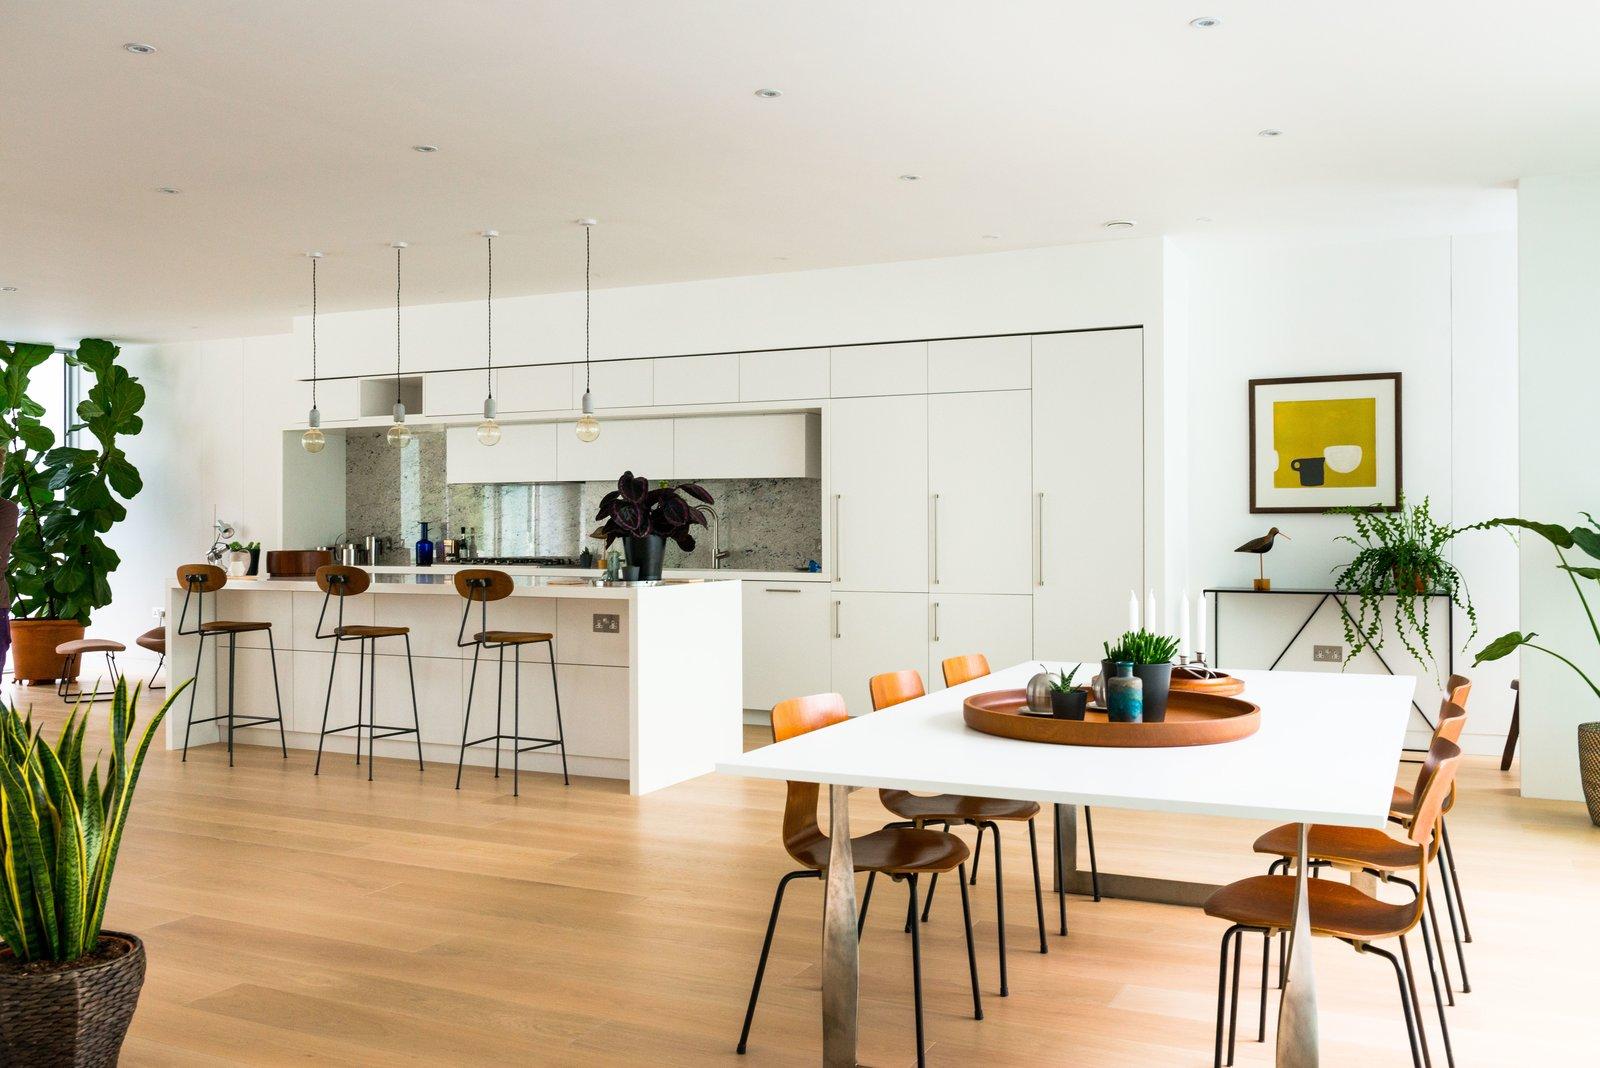 Sleek Modern Loft Apartments For In A Heritage Neighborhood Of London